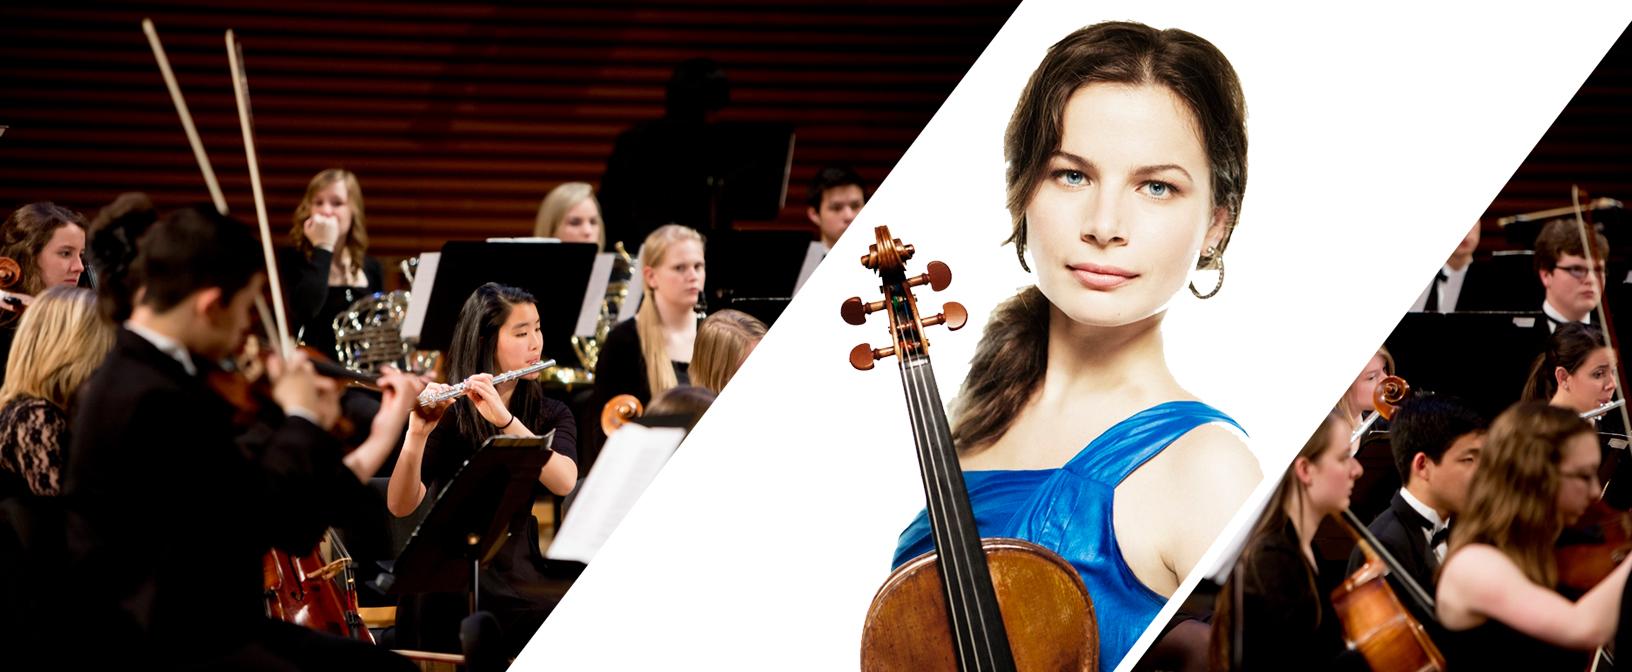 Harriman-Jewell Series/Symphony Performance